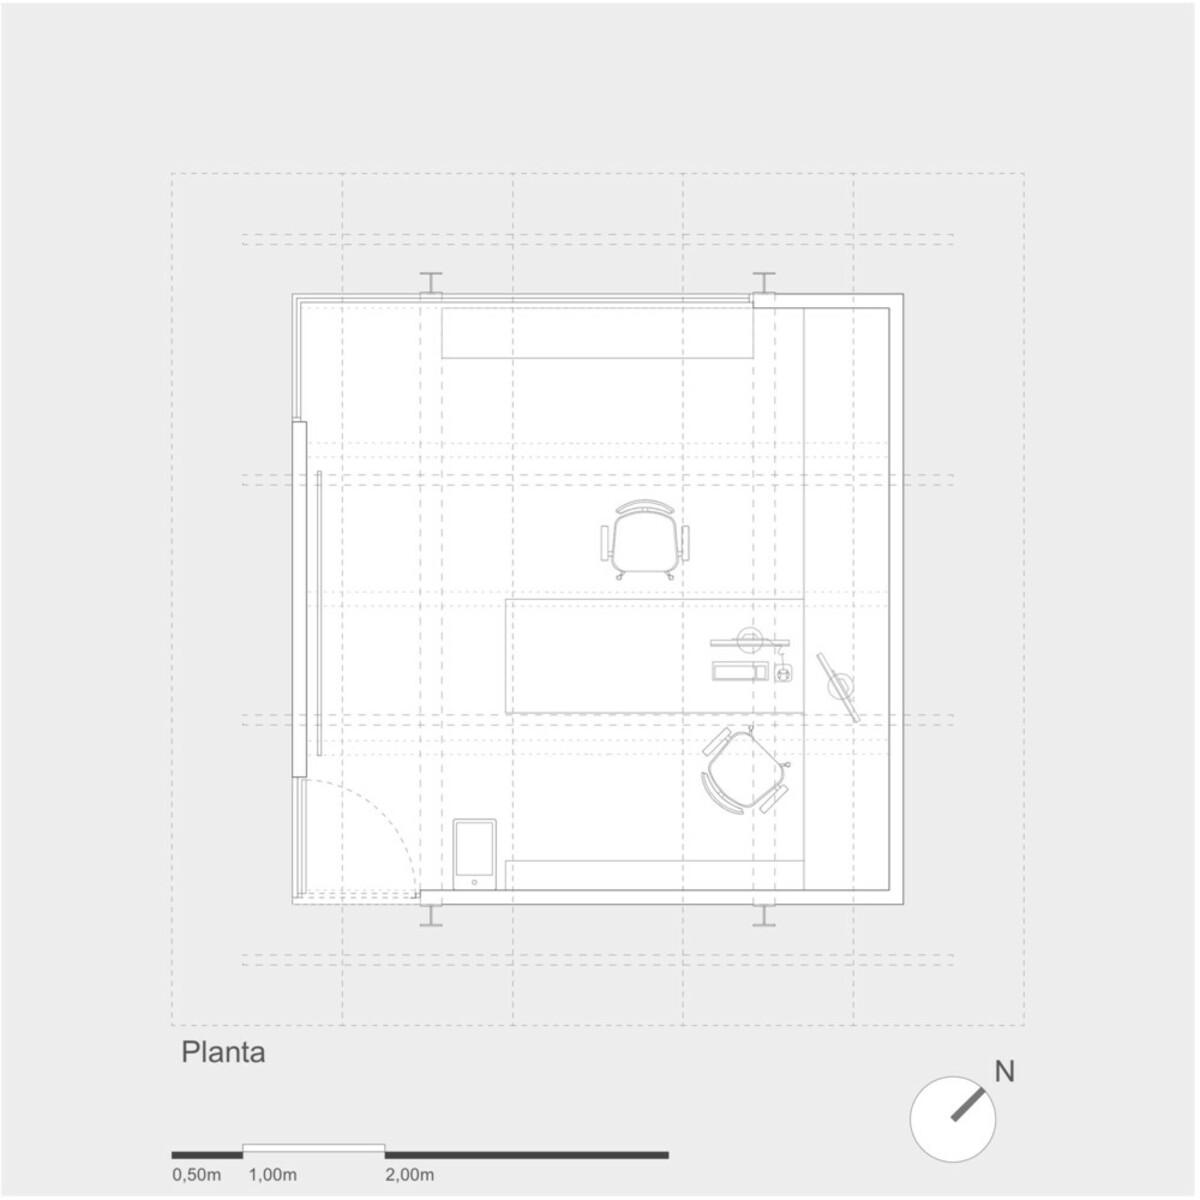 4x4_Studio_-_Teresa_Mascaro.jpg